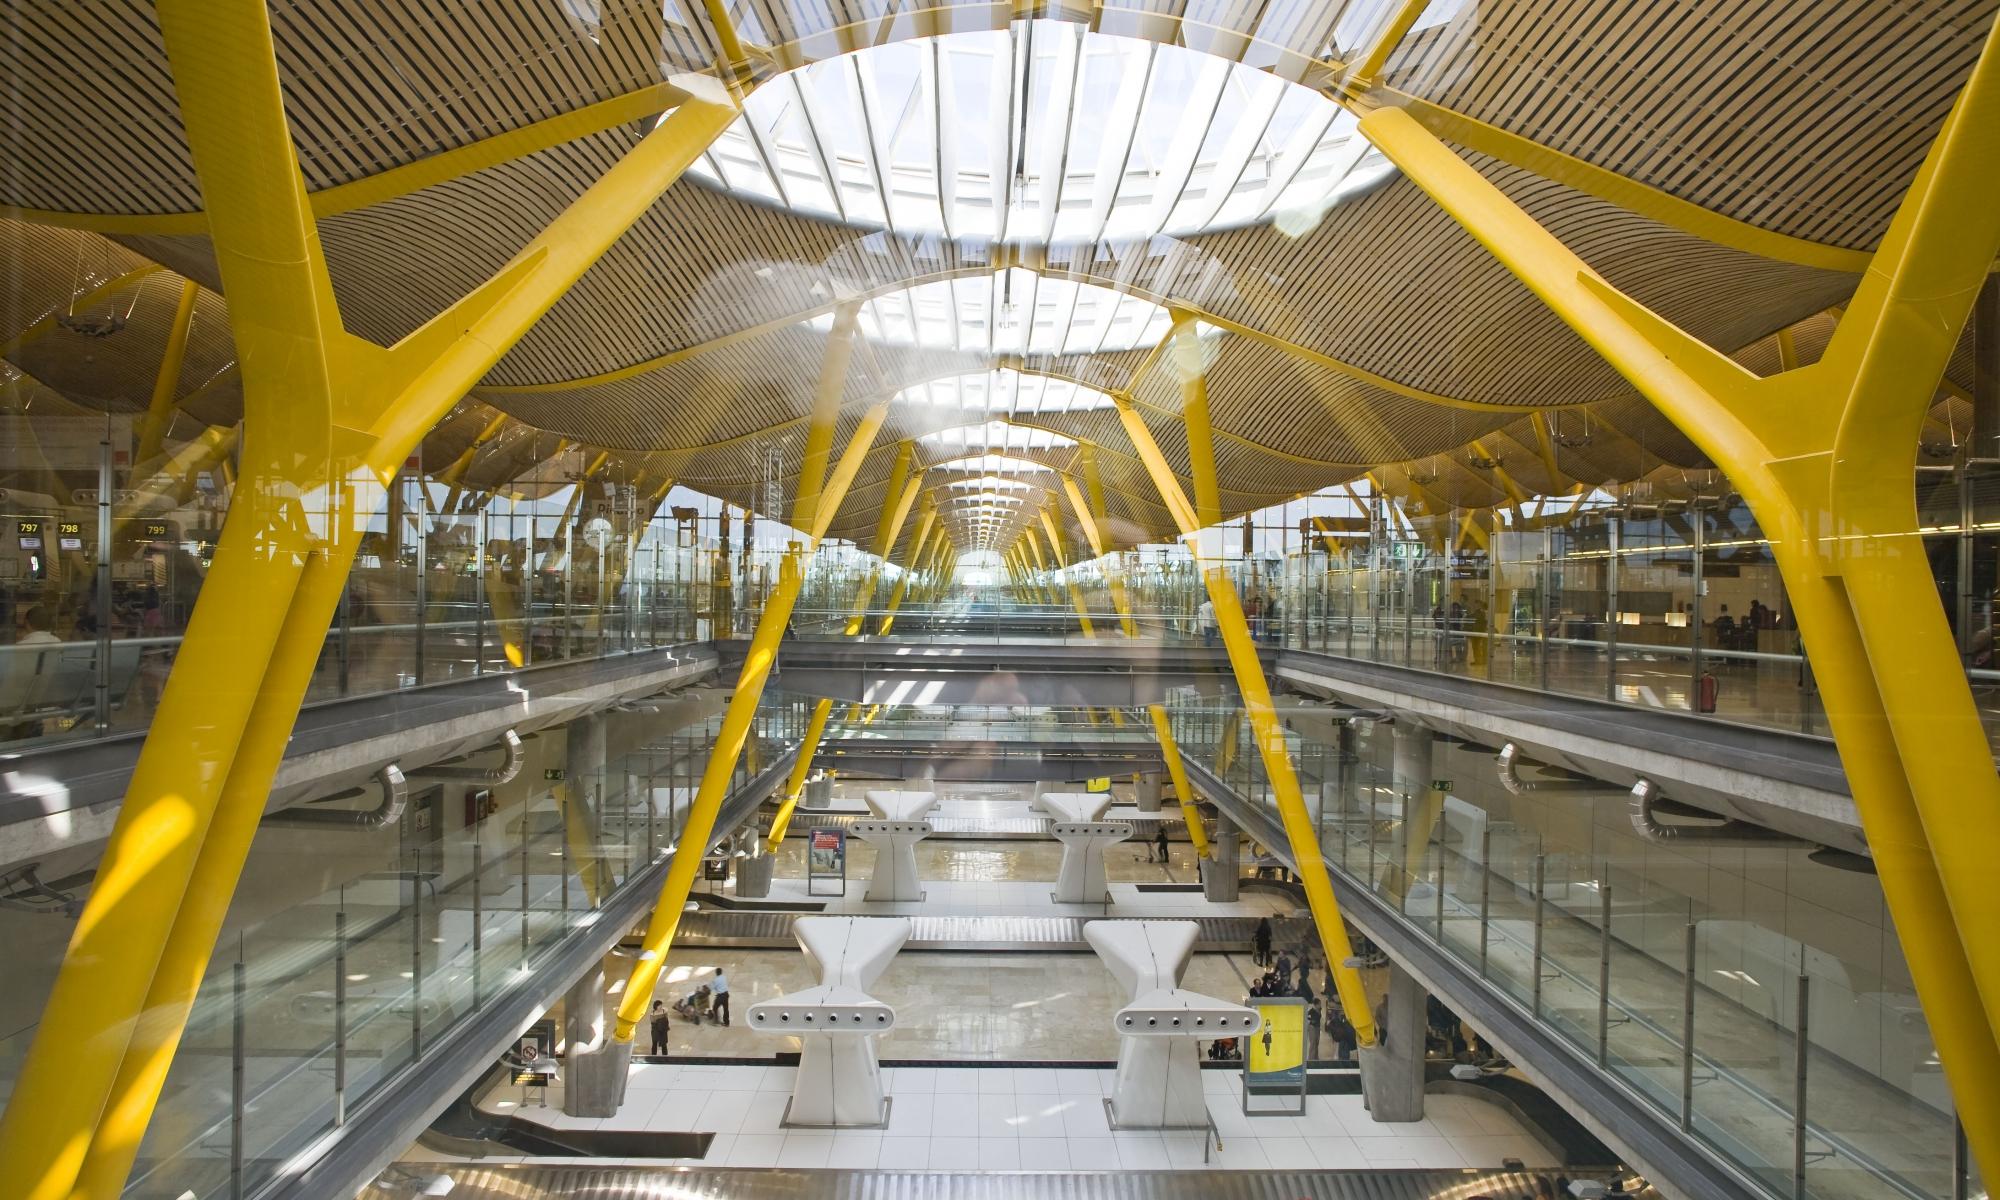 Aeropuerto Adolfo Suárez-Madrid Barajas. Terminal T4